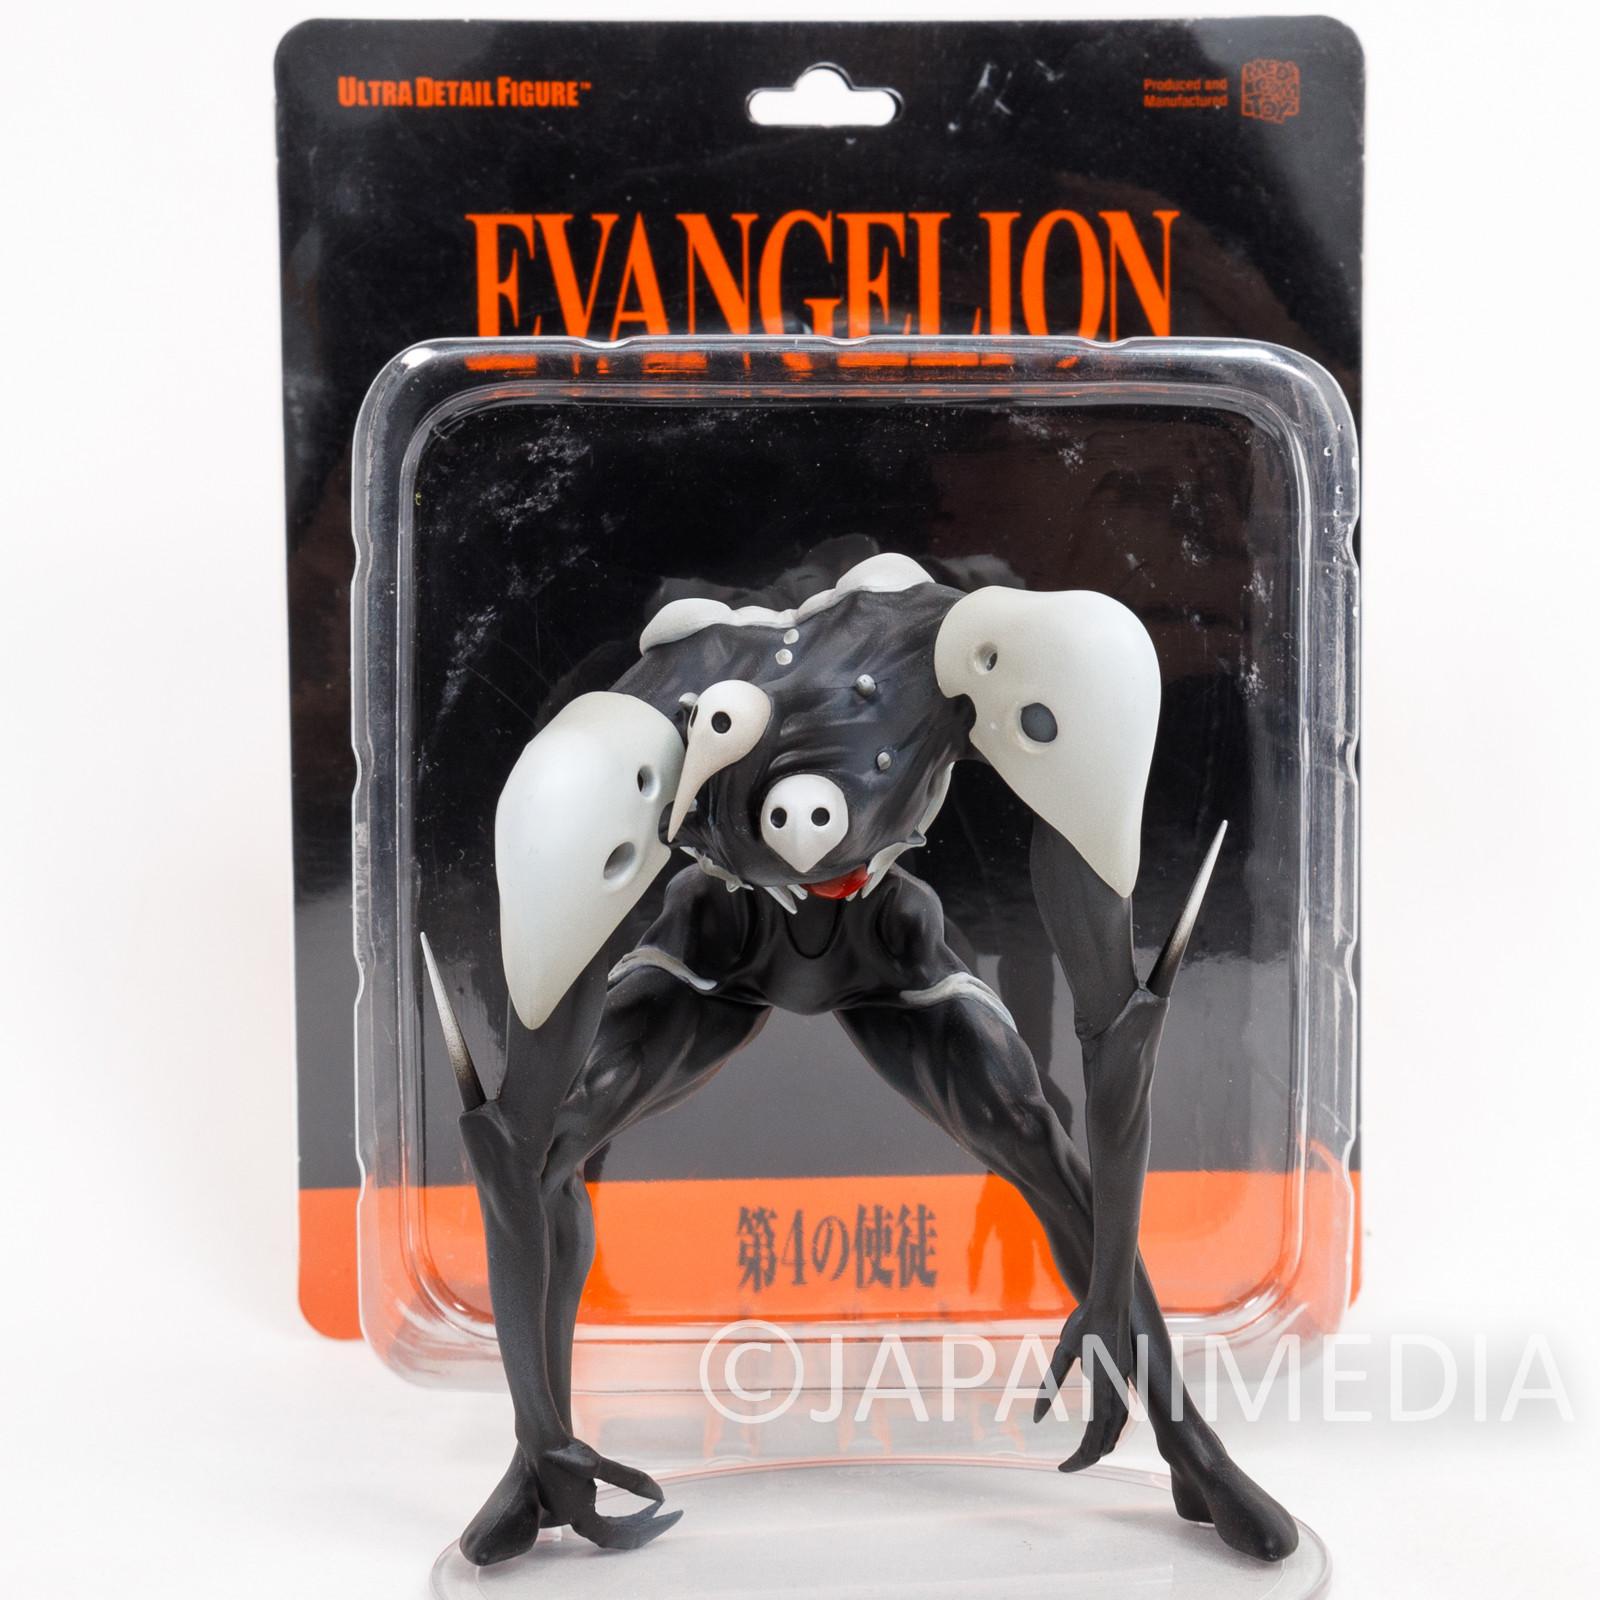 Evangelion 4th Angel Shito Sachiel Figure UDF Medidom Toy JAPAN ANIME